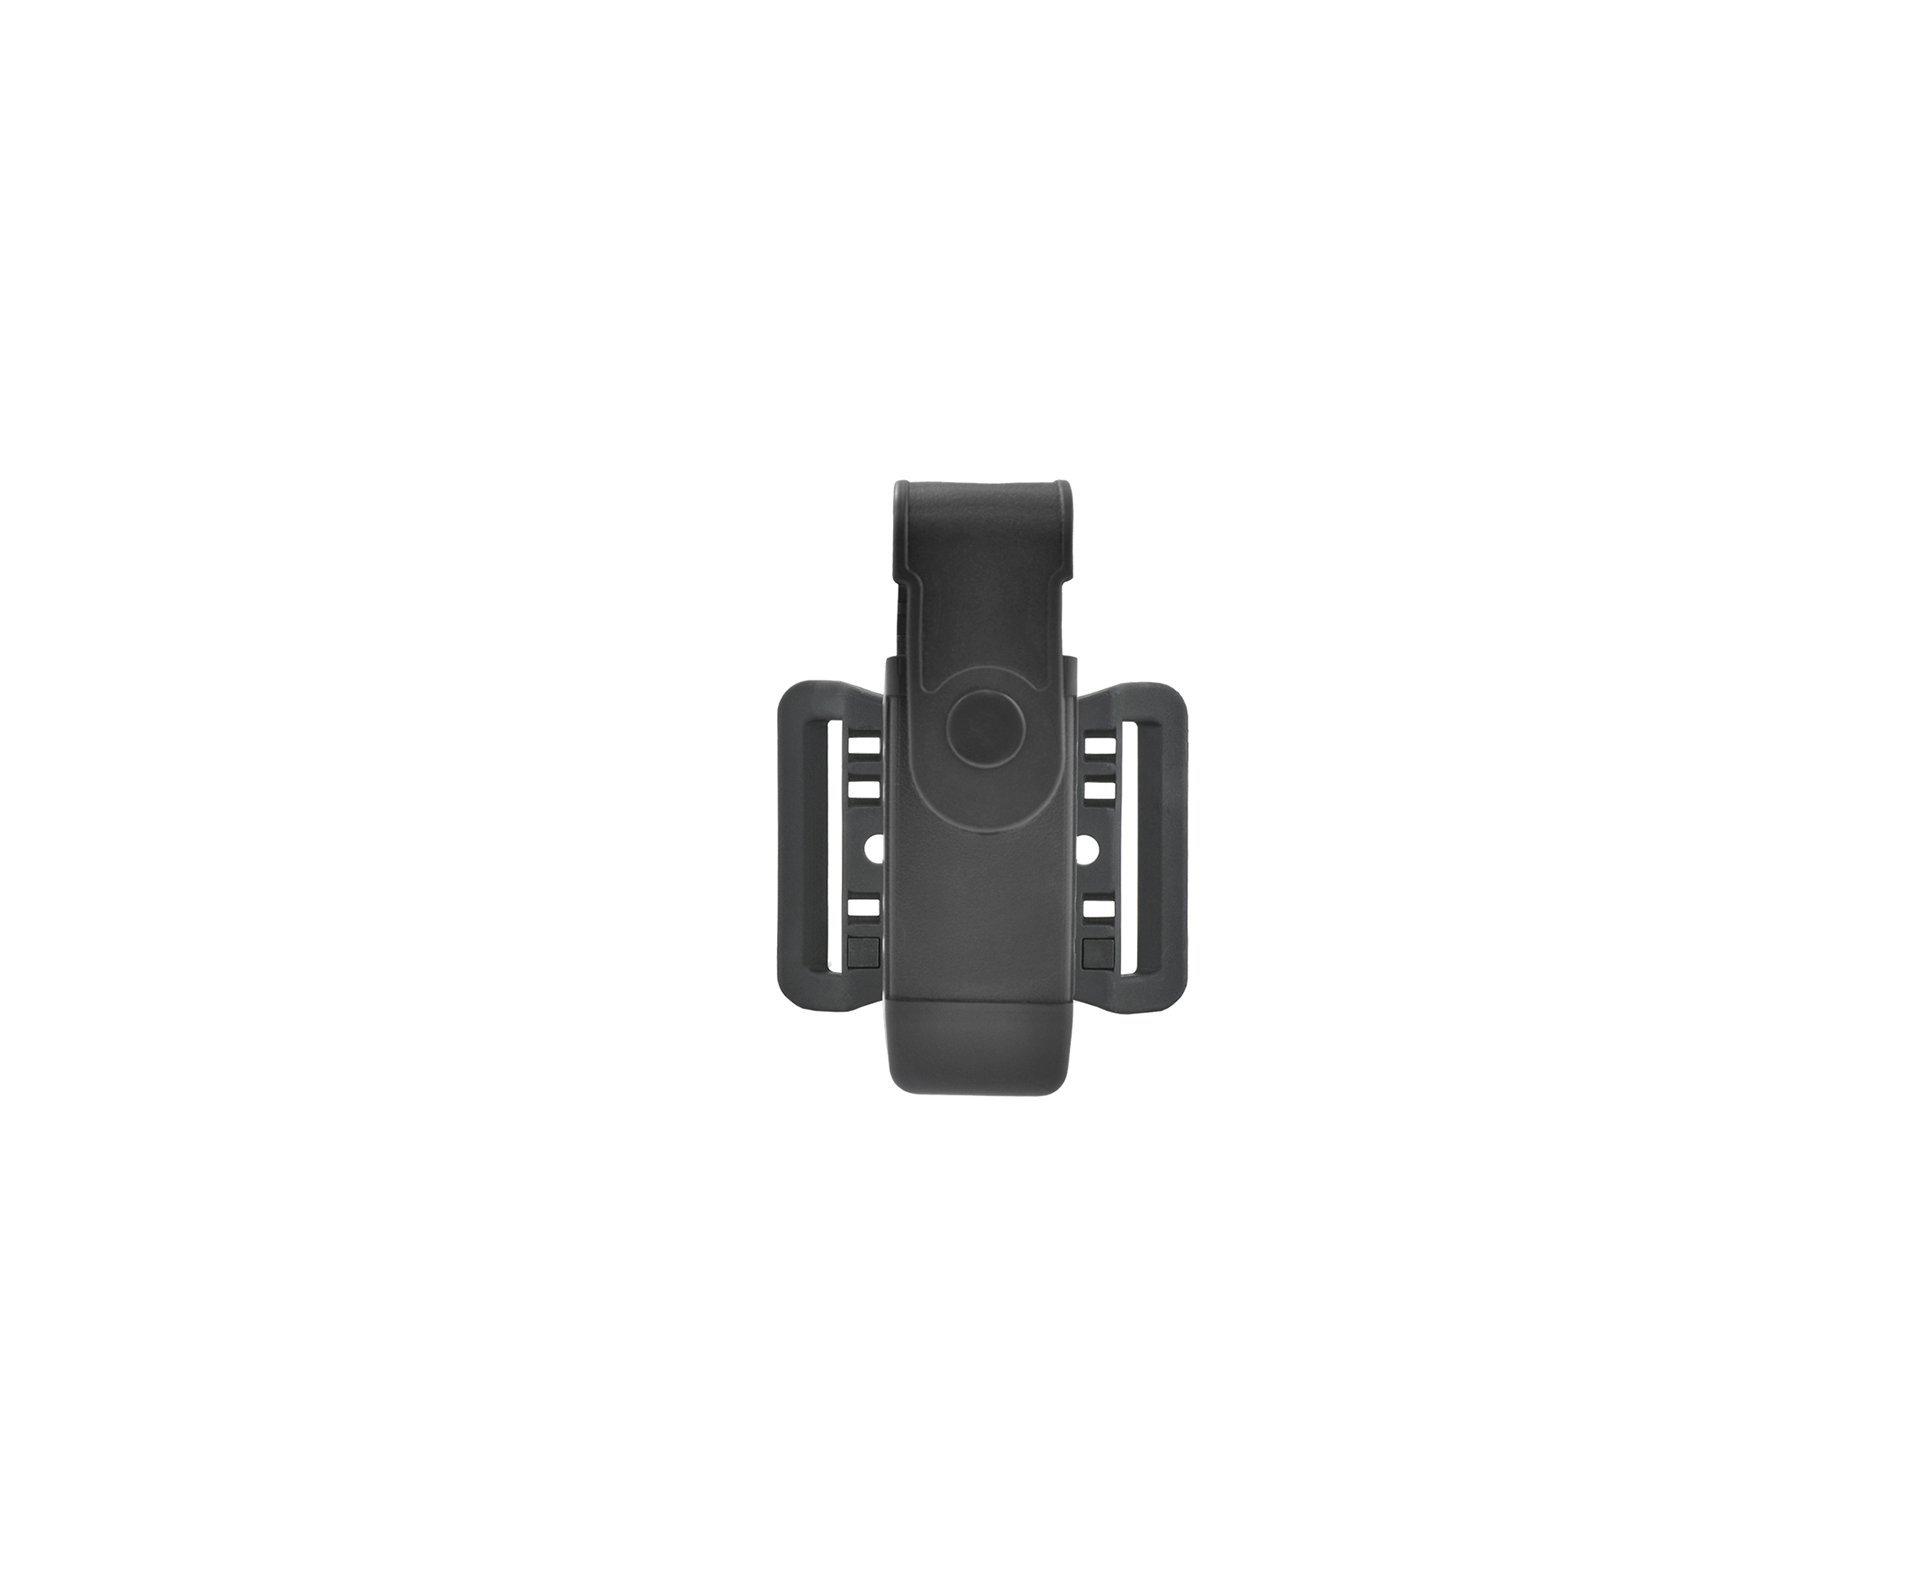 Porta Carregador Pistola Simples Polimero Imbel Md1,2,5 E 6 - Belica